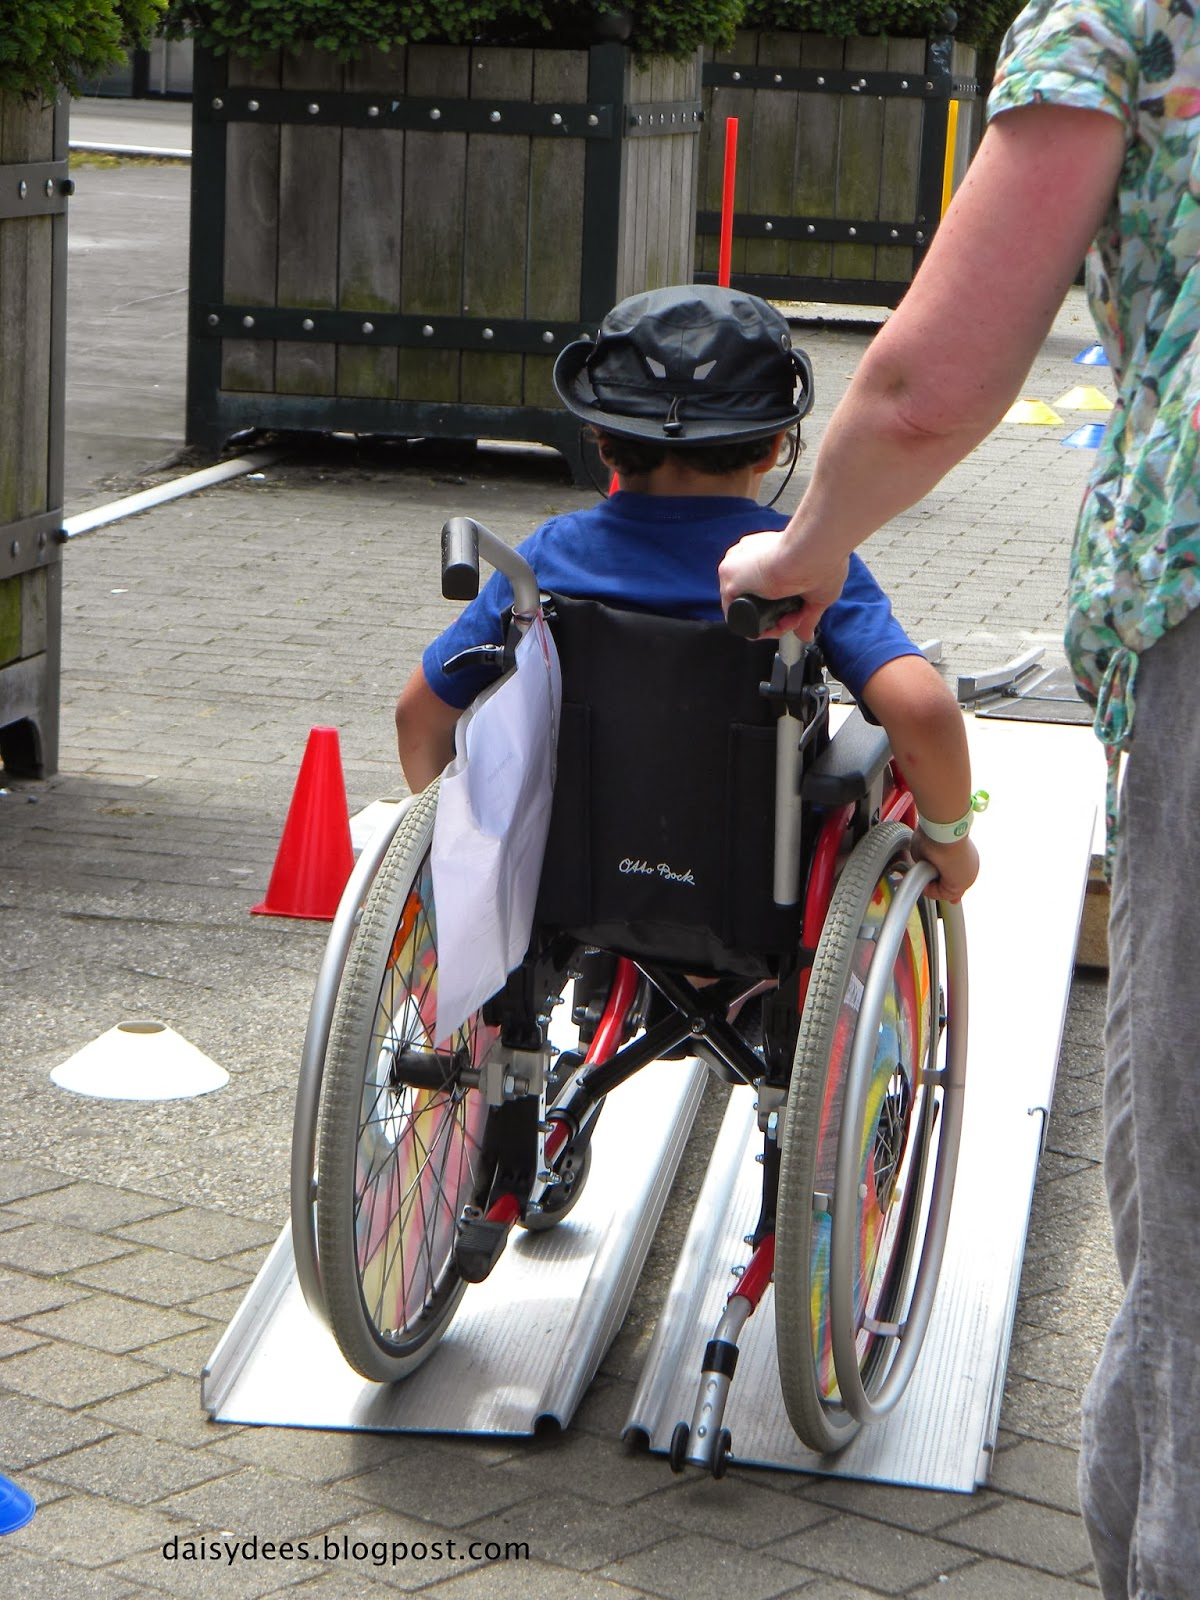 handicap chaise roulante handicap chaise roulante with handicap chaise roulante handicap. Black Bedroom Furniture Sets. Home Design Ideas